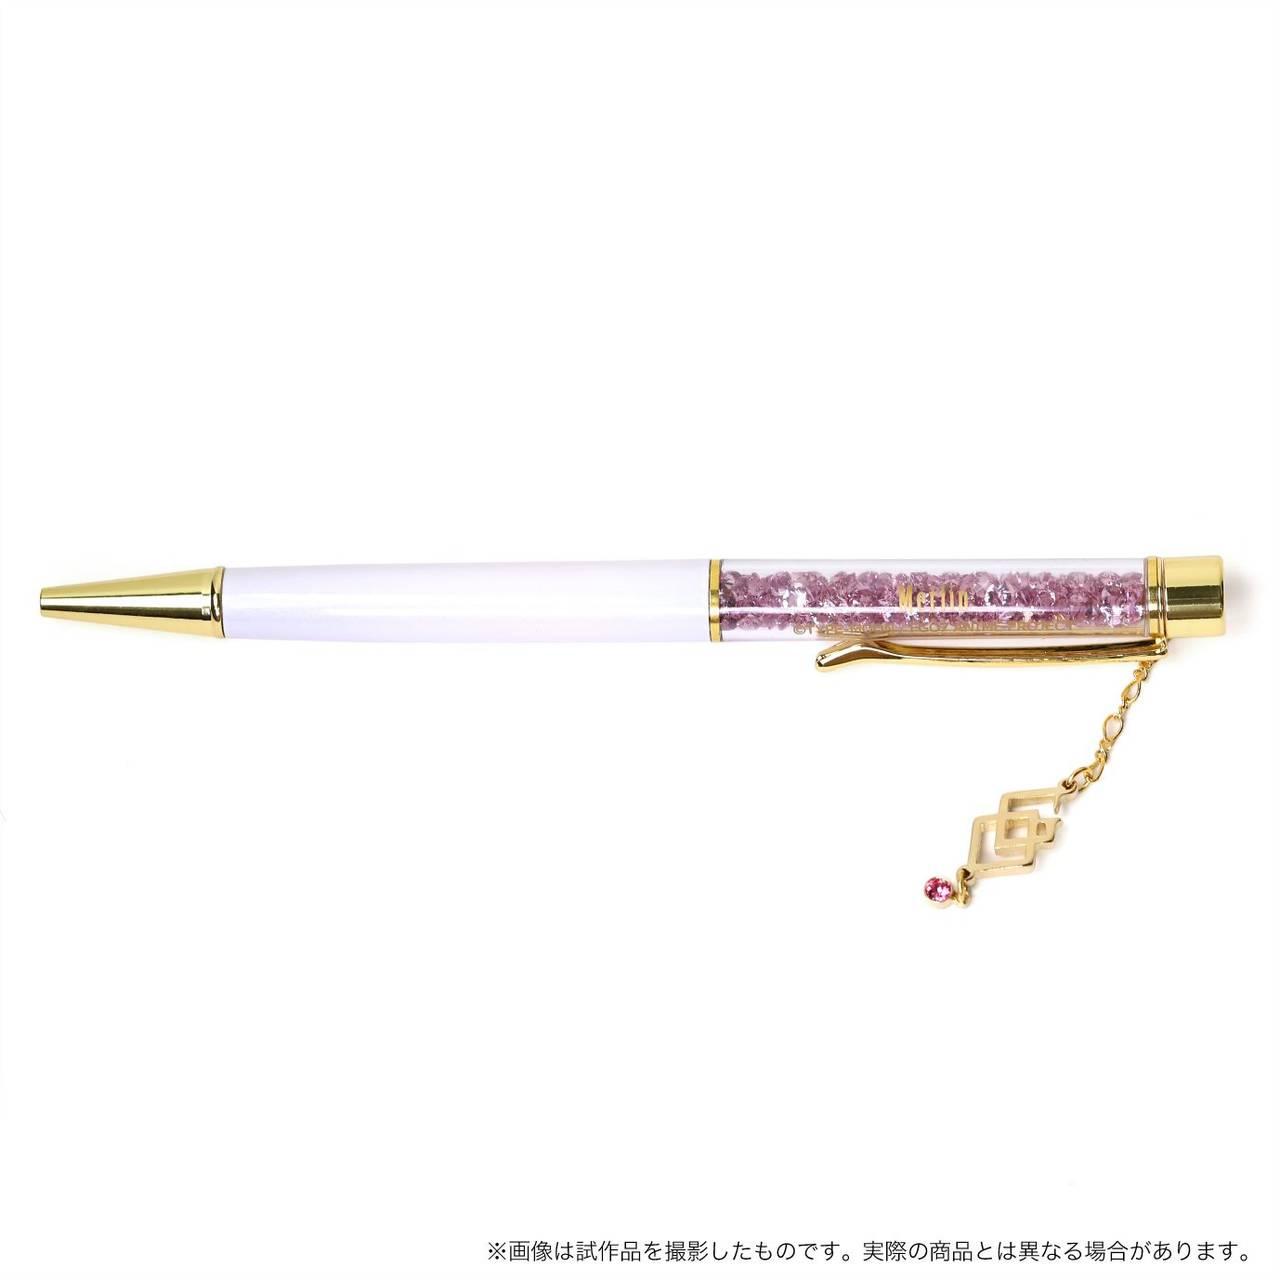 『Fate/Grand Order -絶対魔獣戦線バビロニア-』スワロフスキークリスタル入りボールペン6